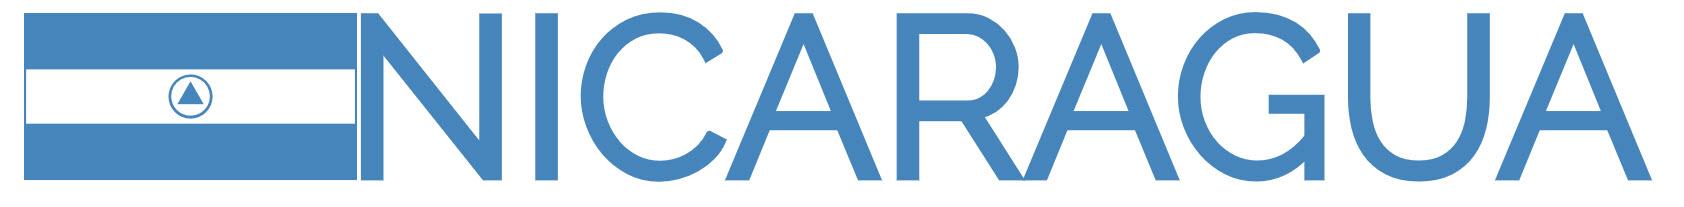 nicaragua logo